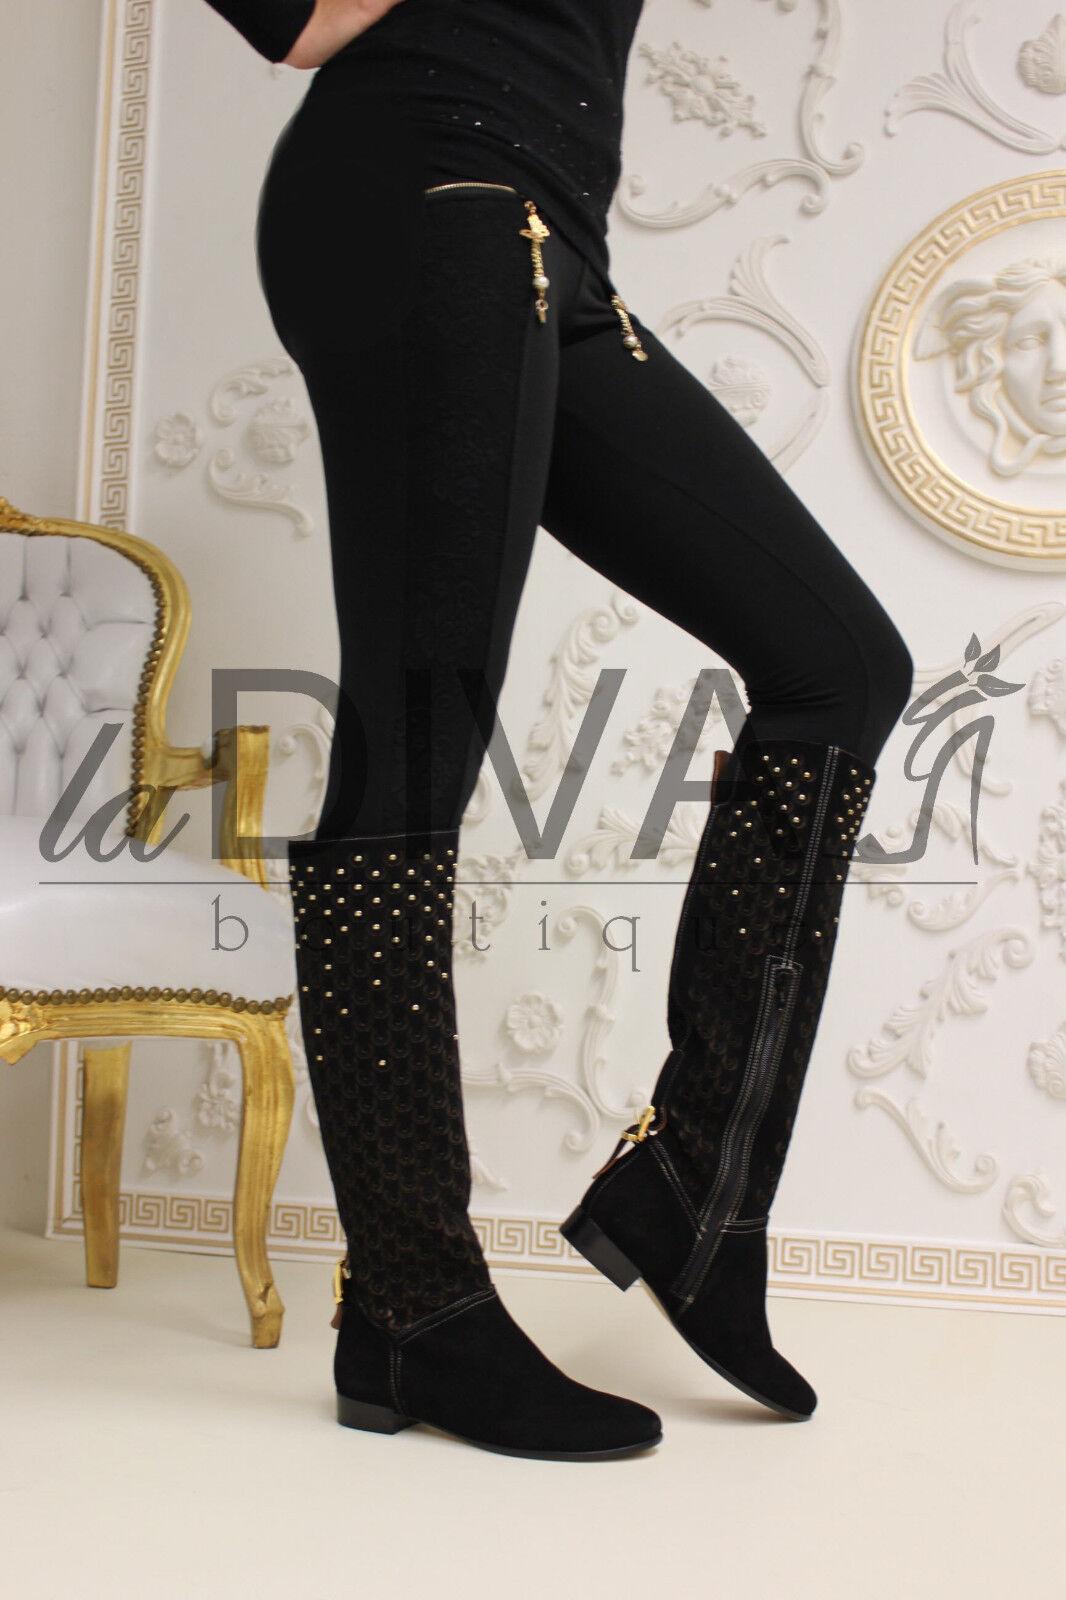 Napoleoni ~ Italy de Designer botas de Italy gamuza 36 negro tachuelas láser cut cuero c848d2